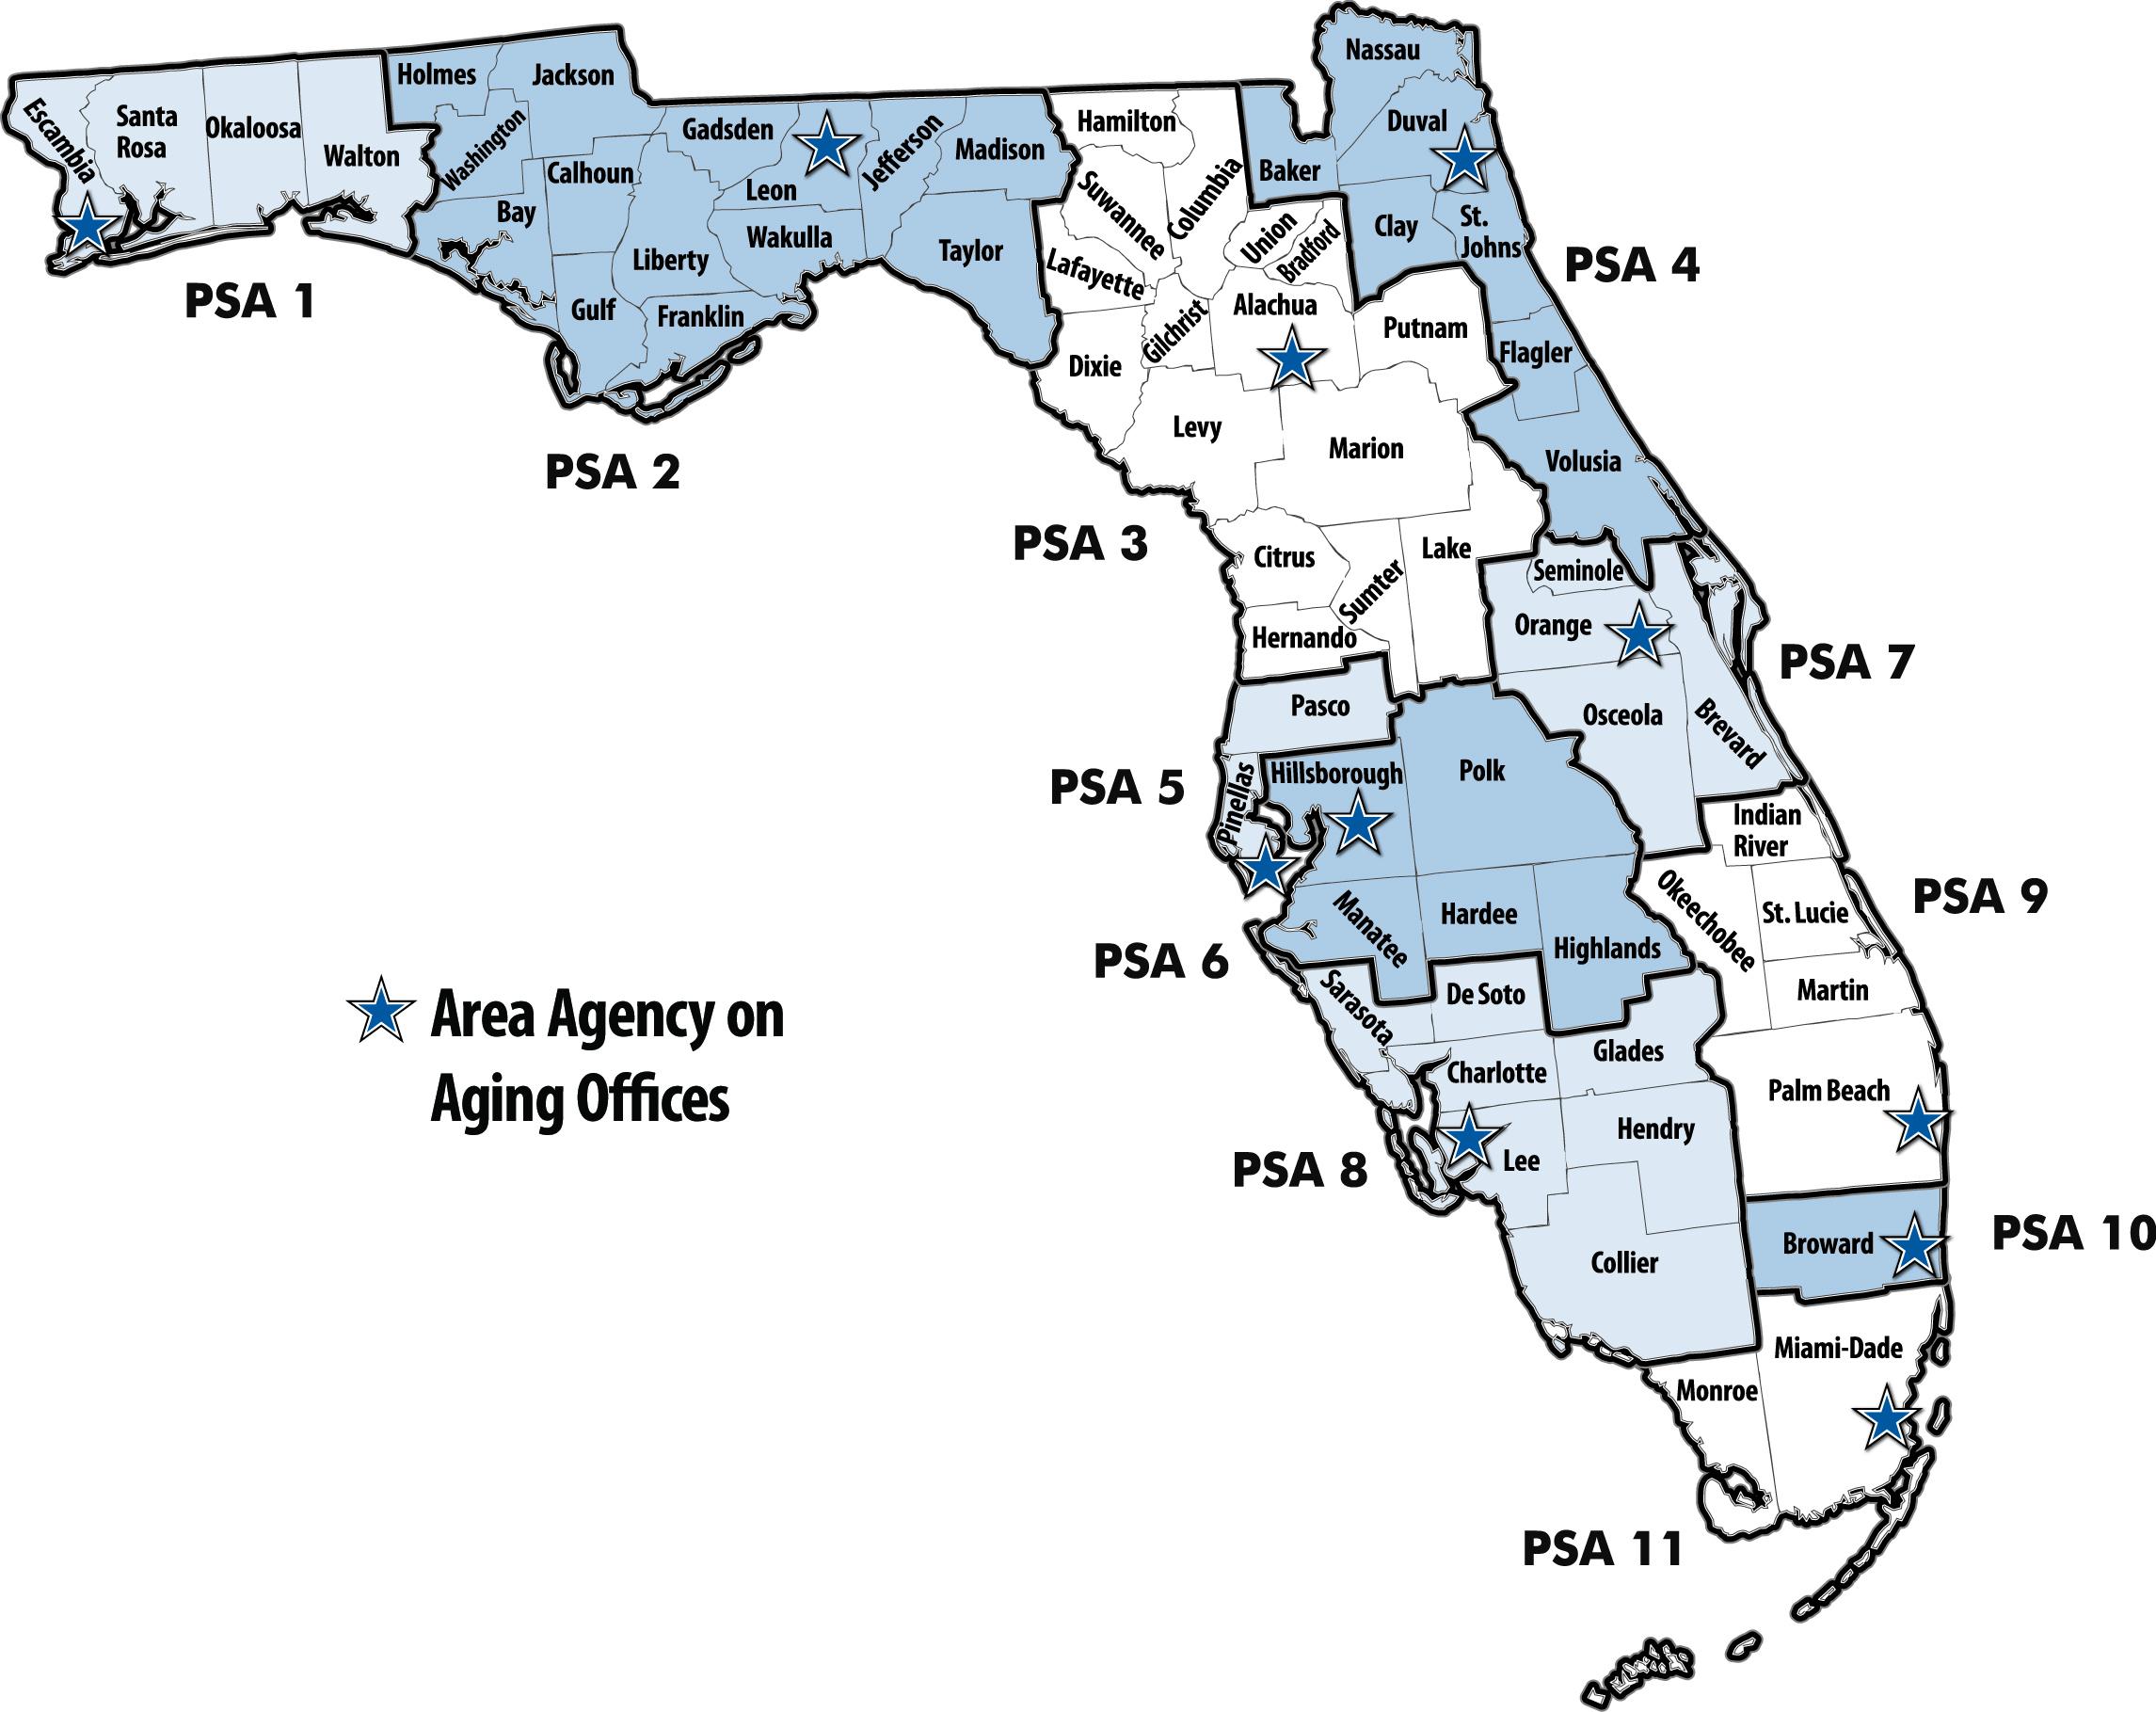 Florida Department Of Elder Affairs - Aaa Performance Measures - Aaa Maps Florida